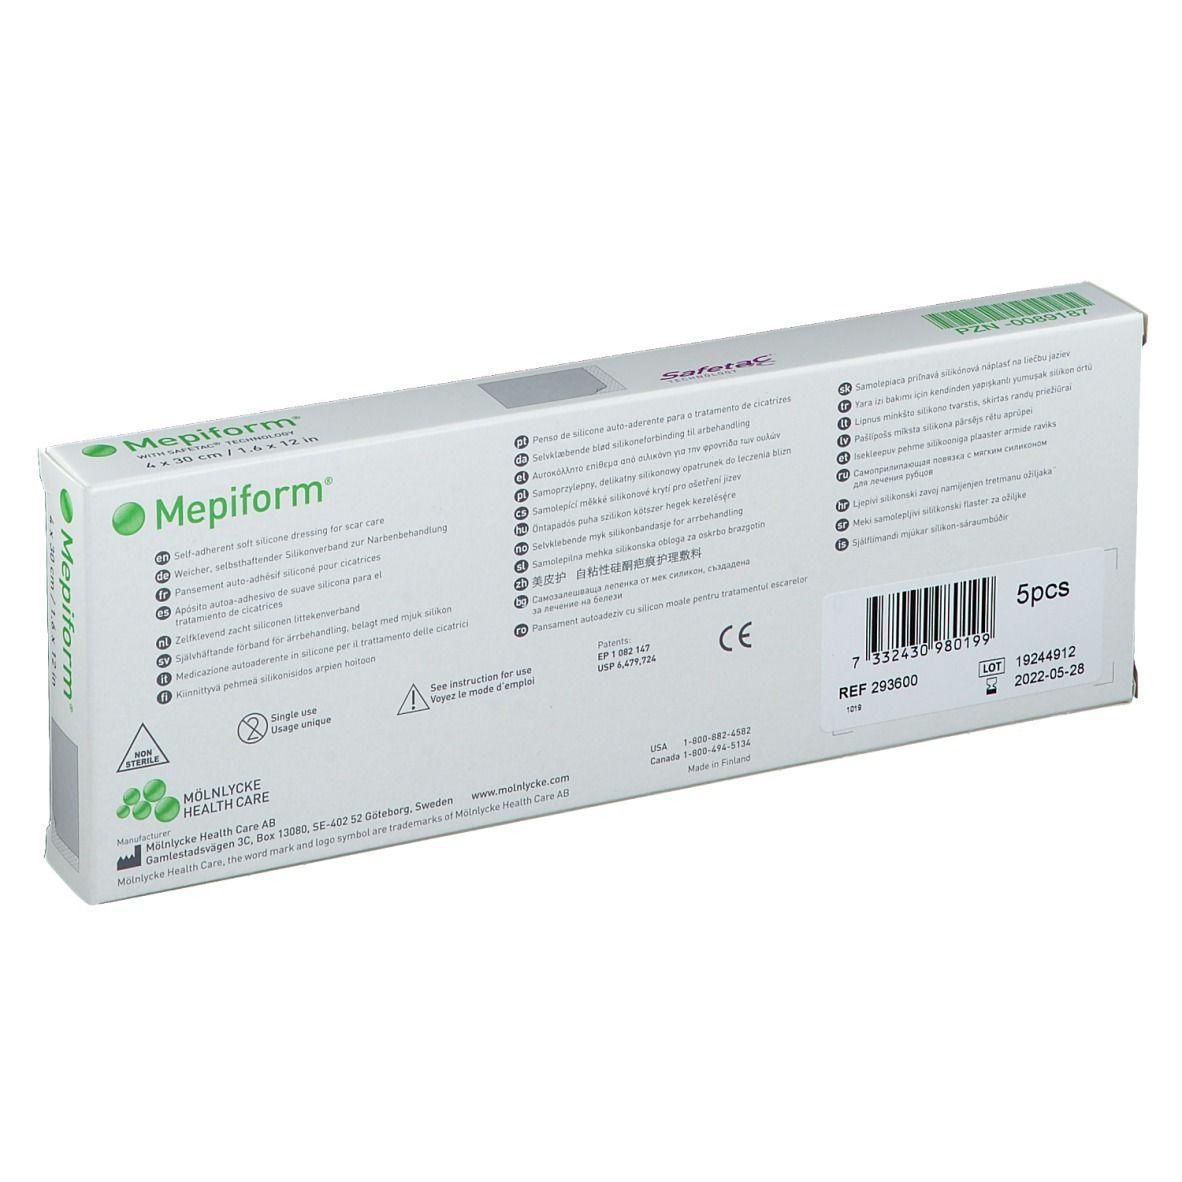 Mepiform® Nerbenverband 4 x 30 cm